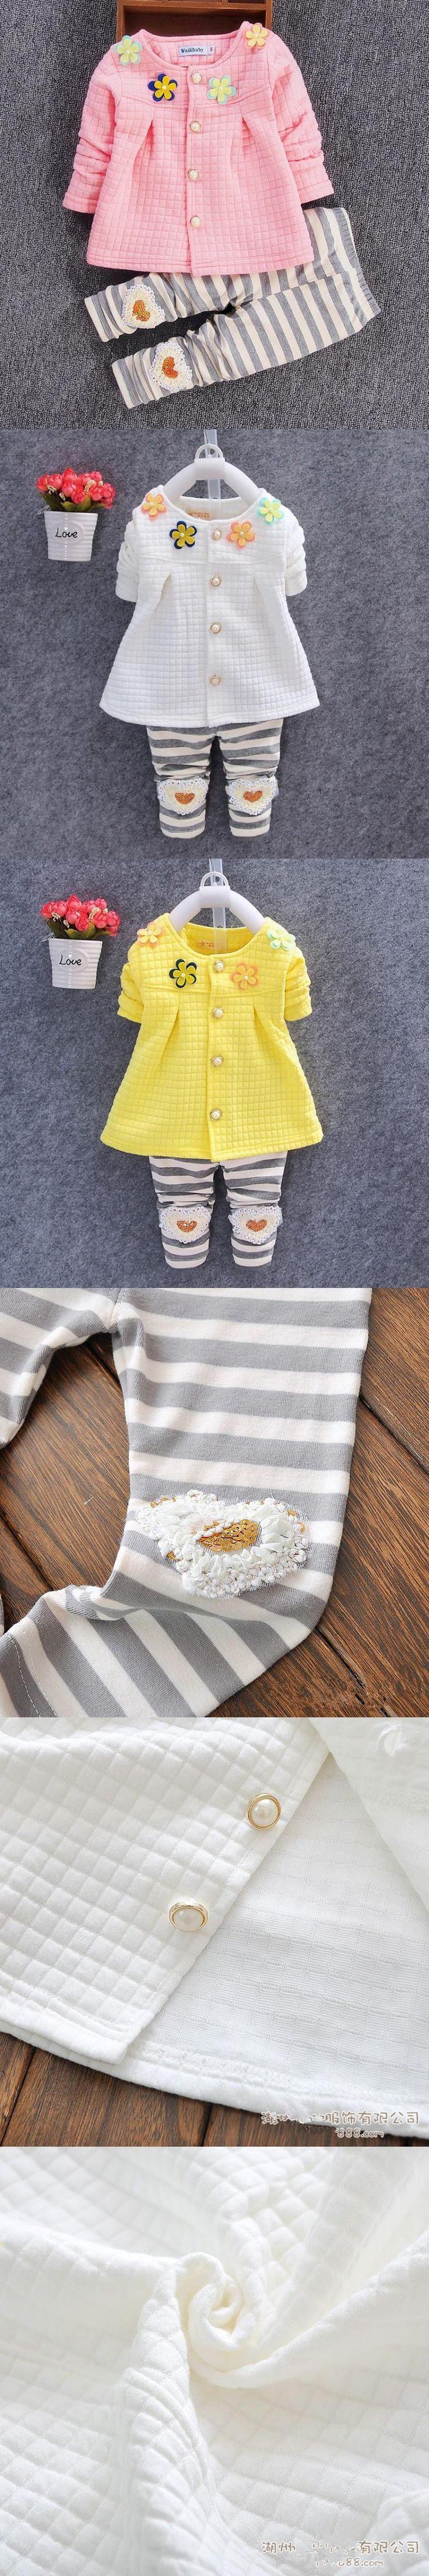 Baby Girl Clothes 2016 Spring Fashion Newborn Baby Girls Clothes Set 3-24M Cotton Full Sleeve Clothing Roupa De Bebe Menina